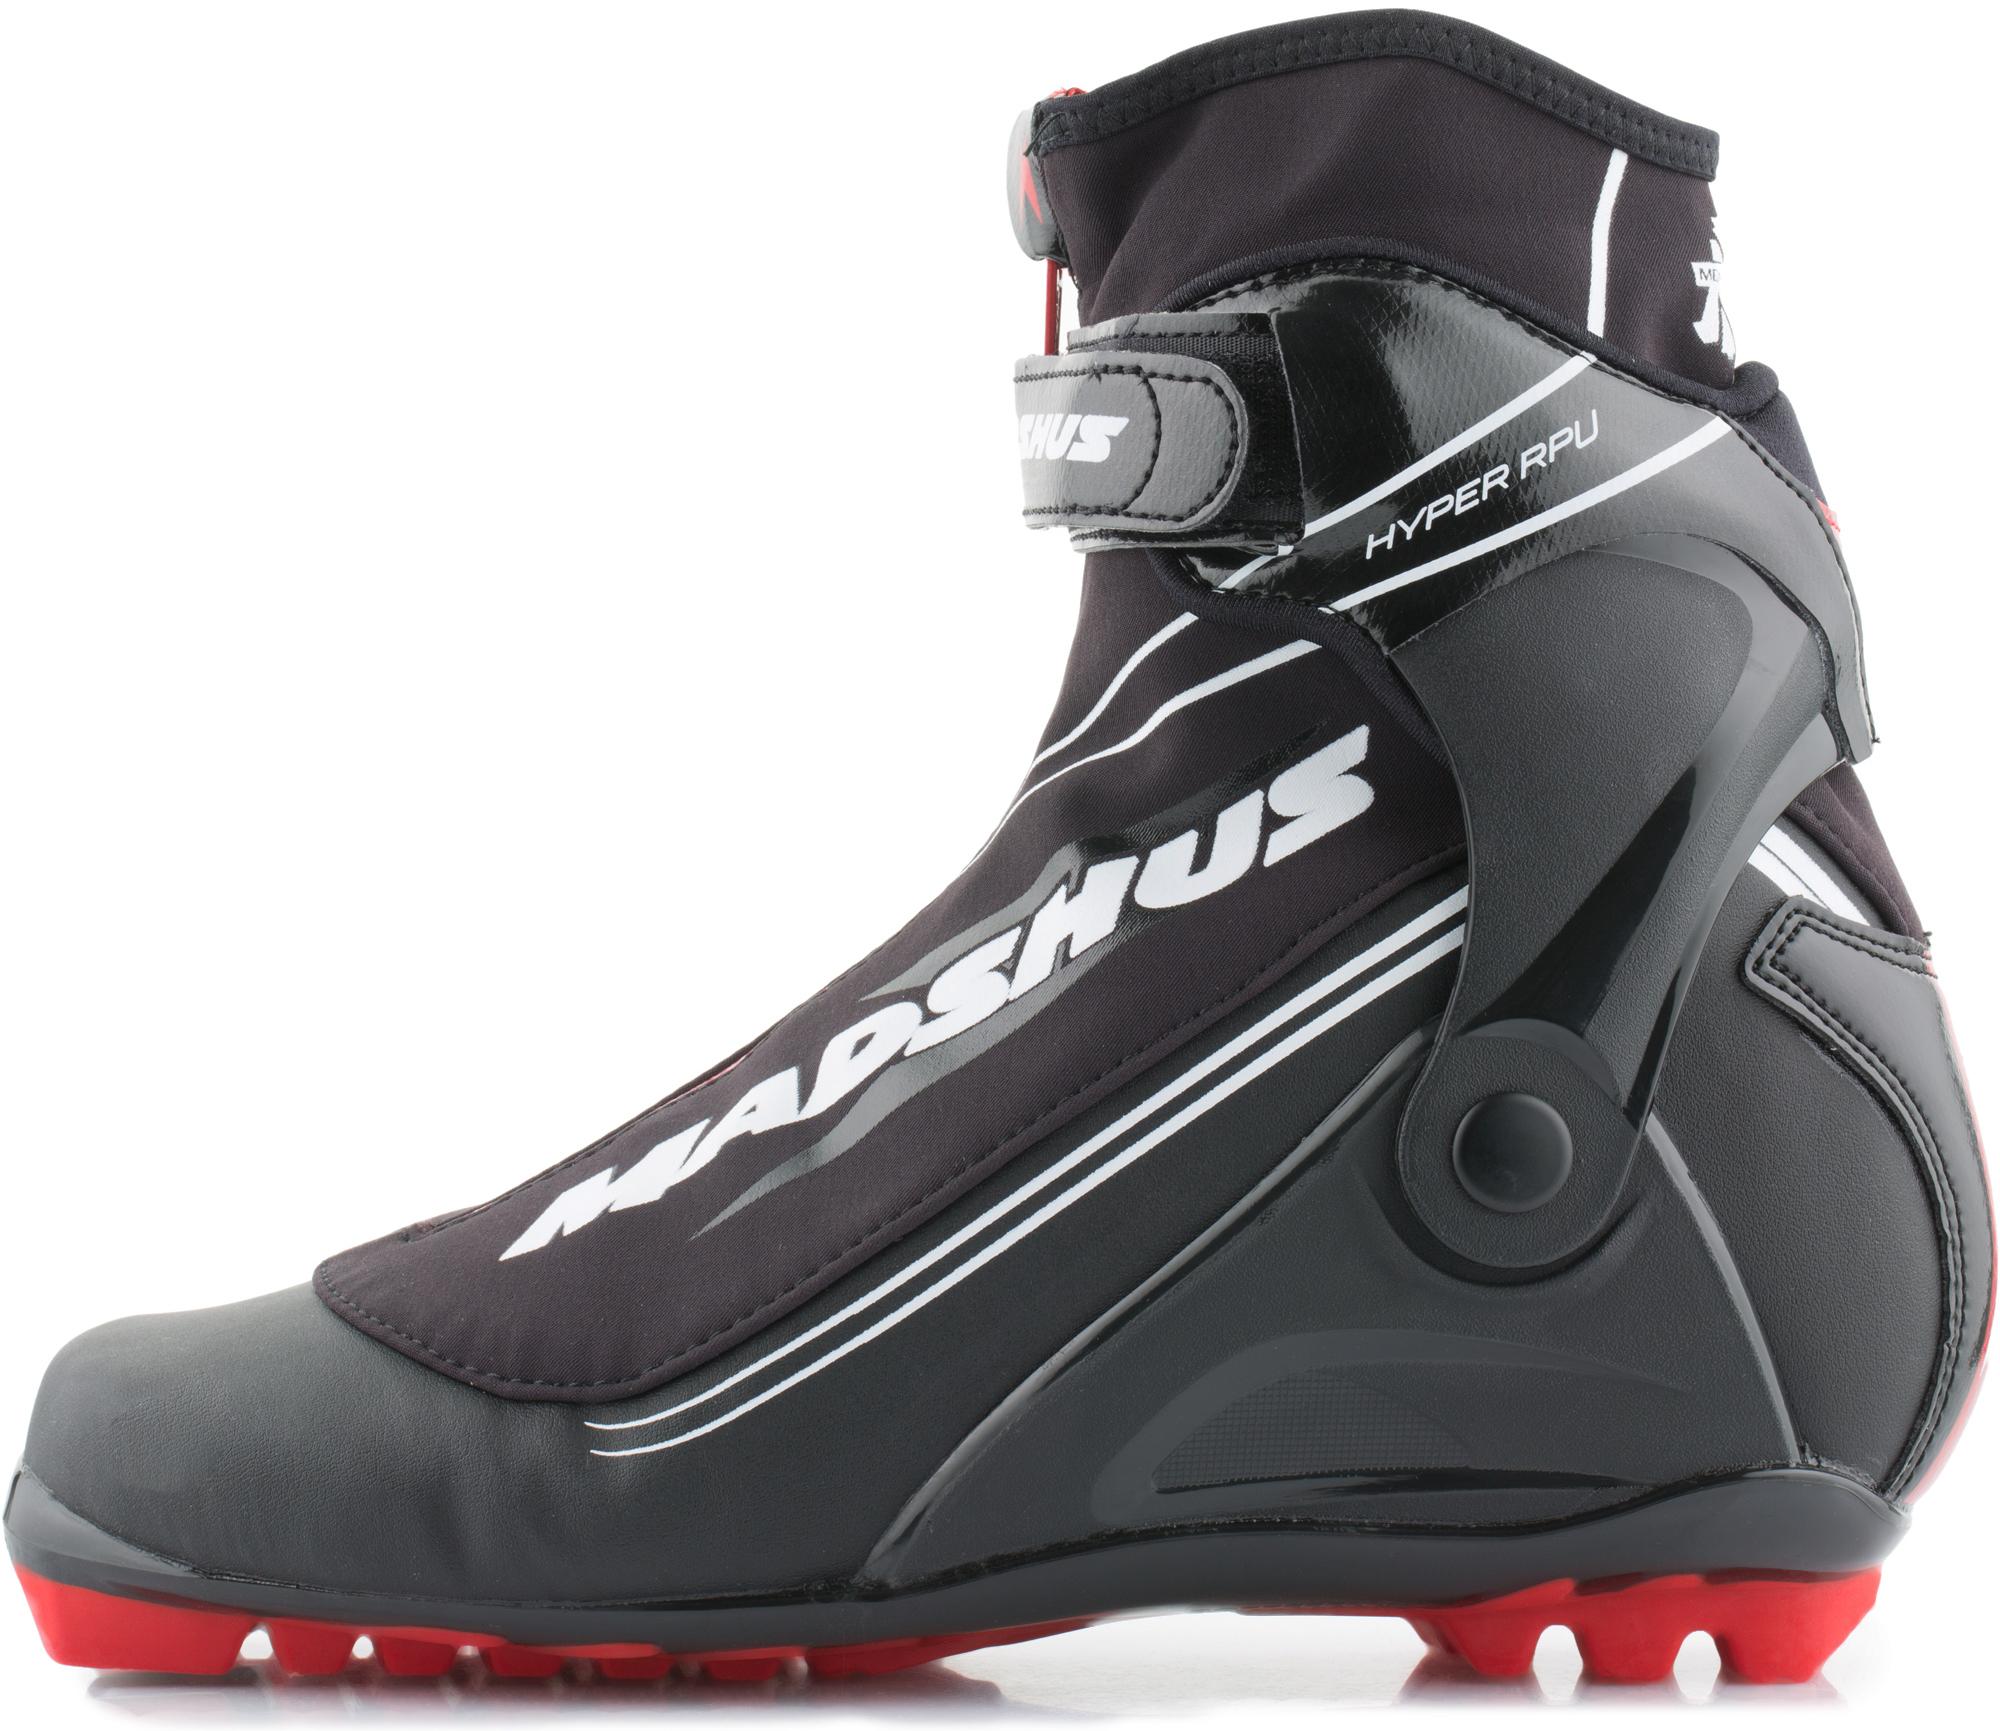 Madshus Ботинки для беговых лыж Hyper RPU